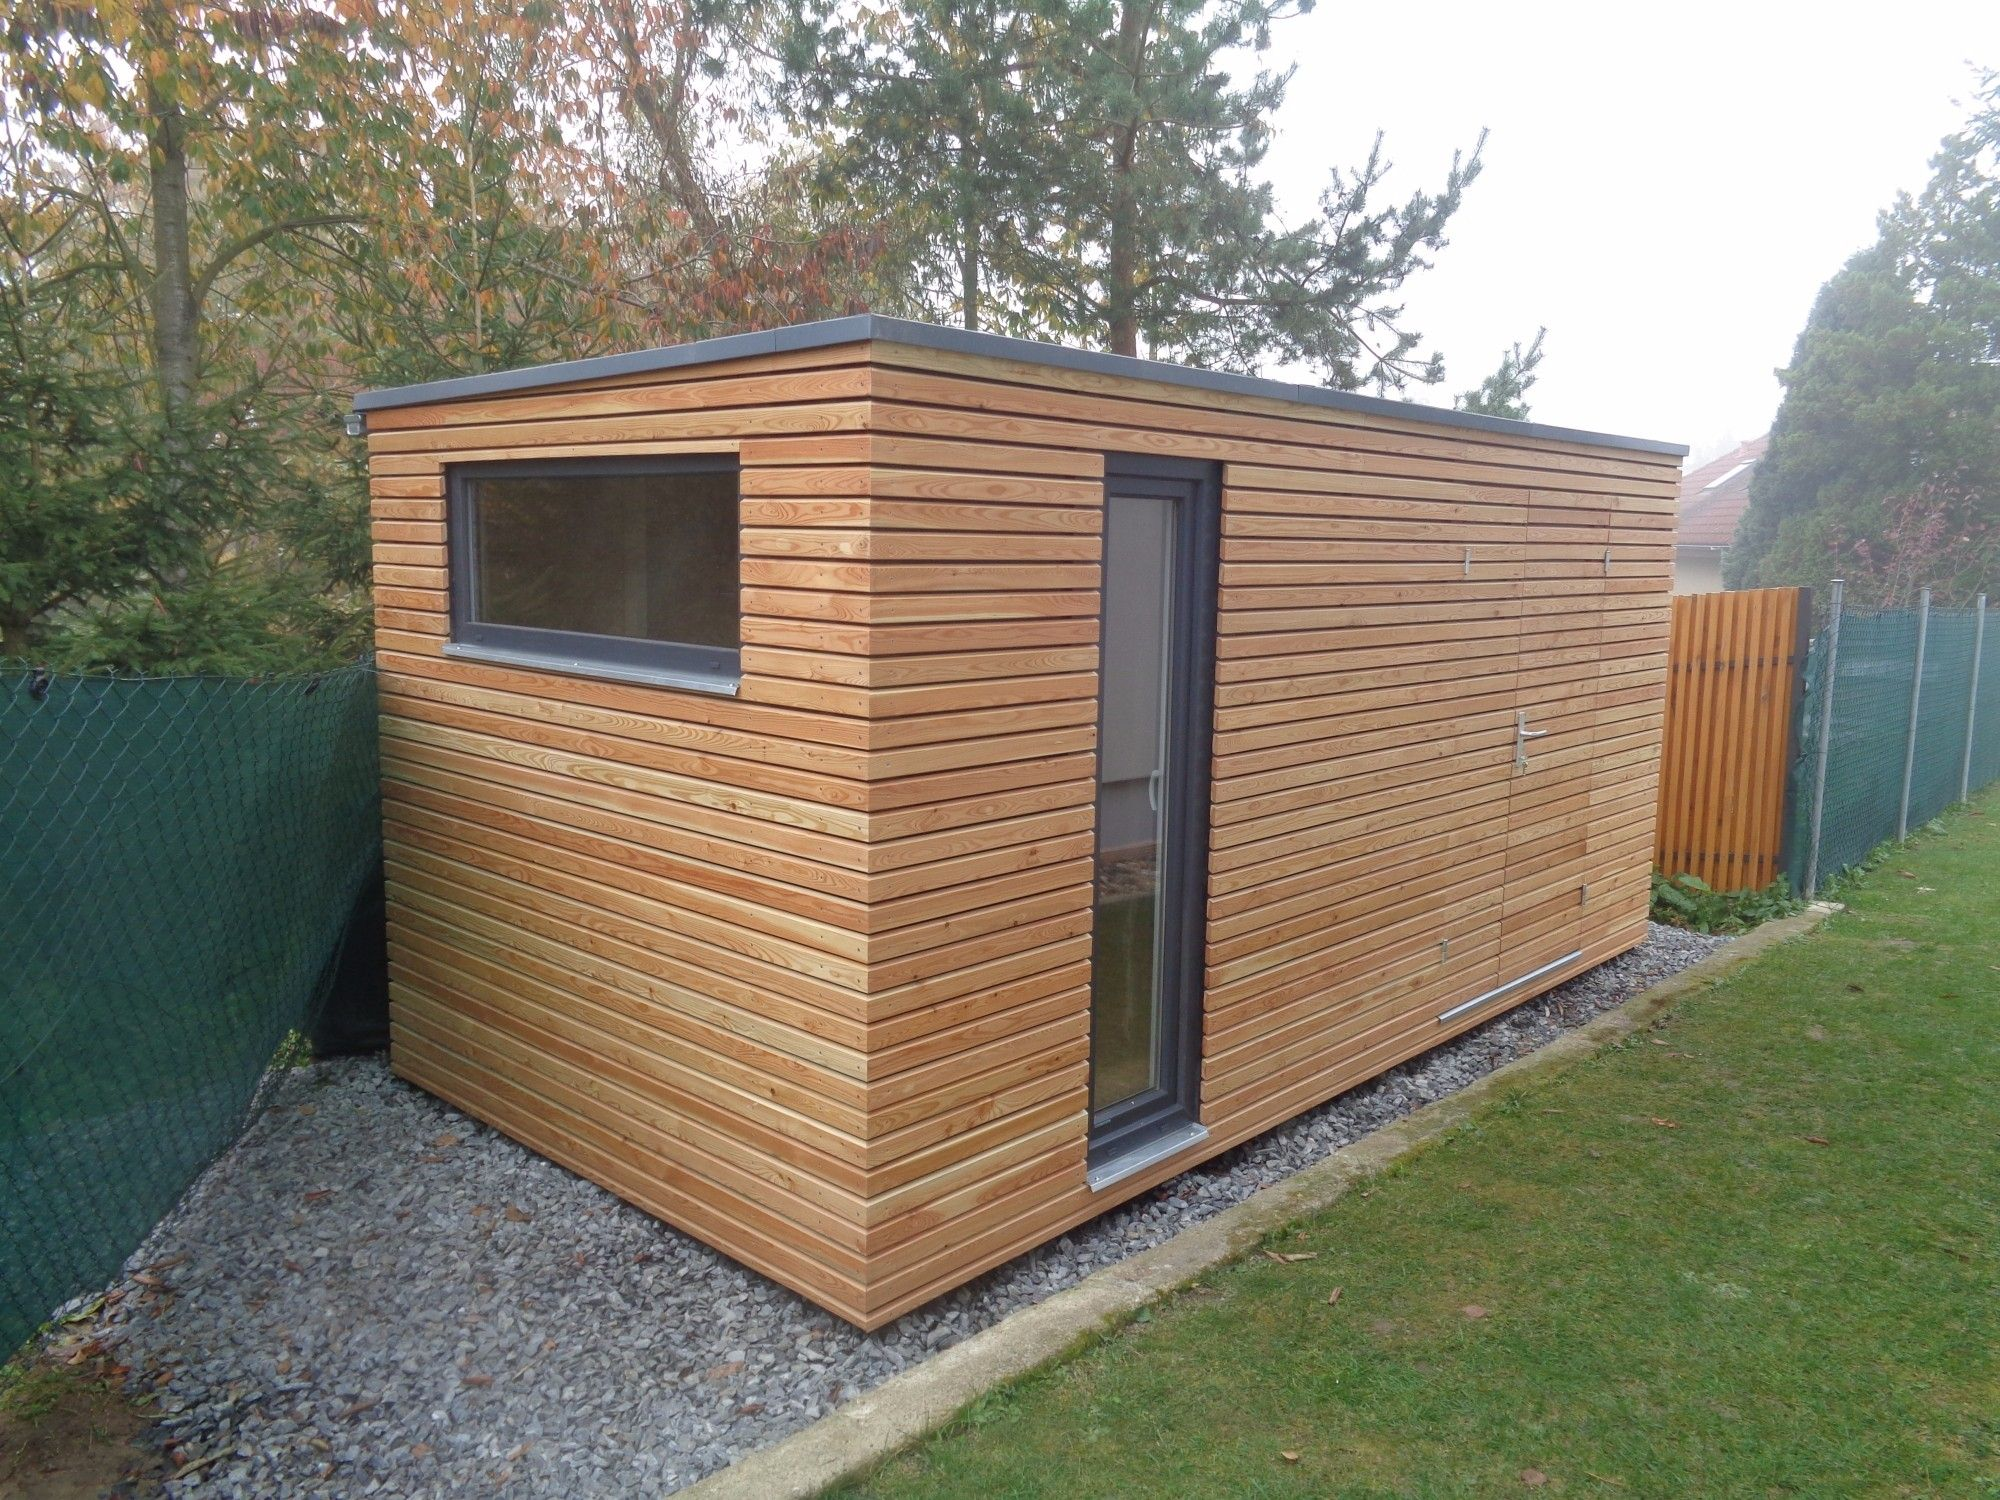 beste gartenzaun 2m hoch design ideen terrasse design ideen. Black Bedroom Furniture Sets. Home Design Ideas